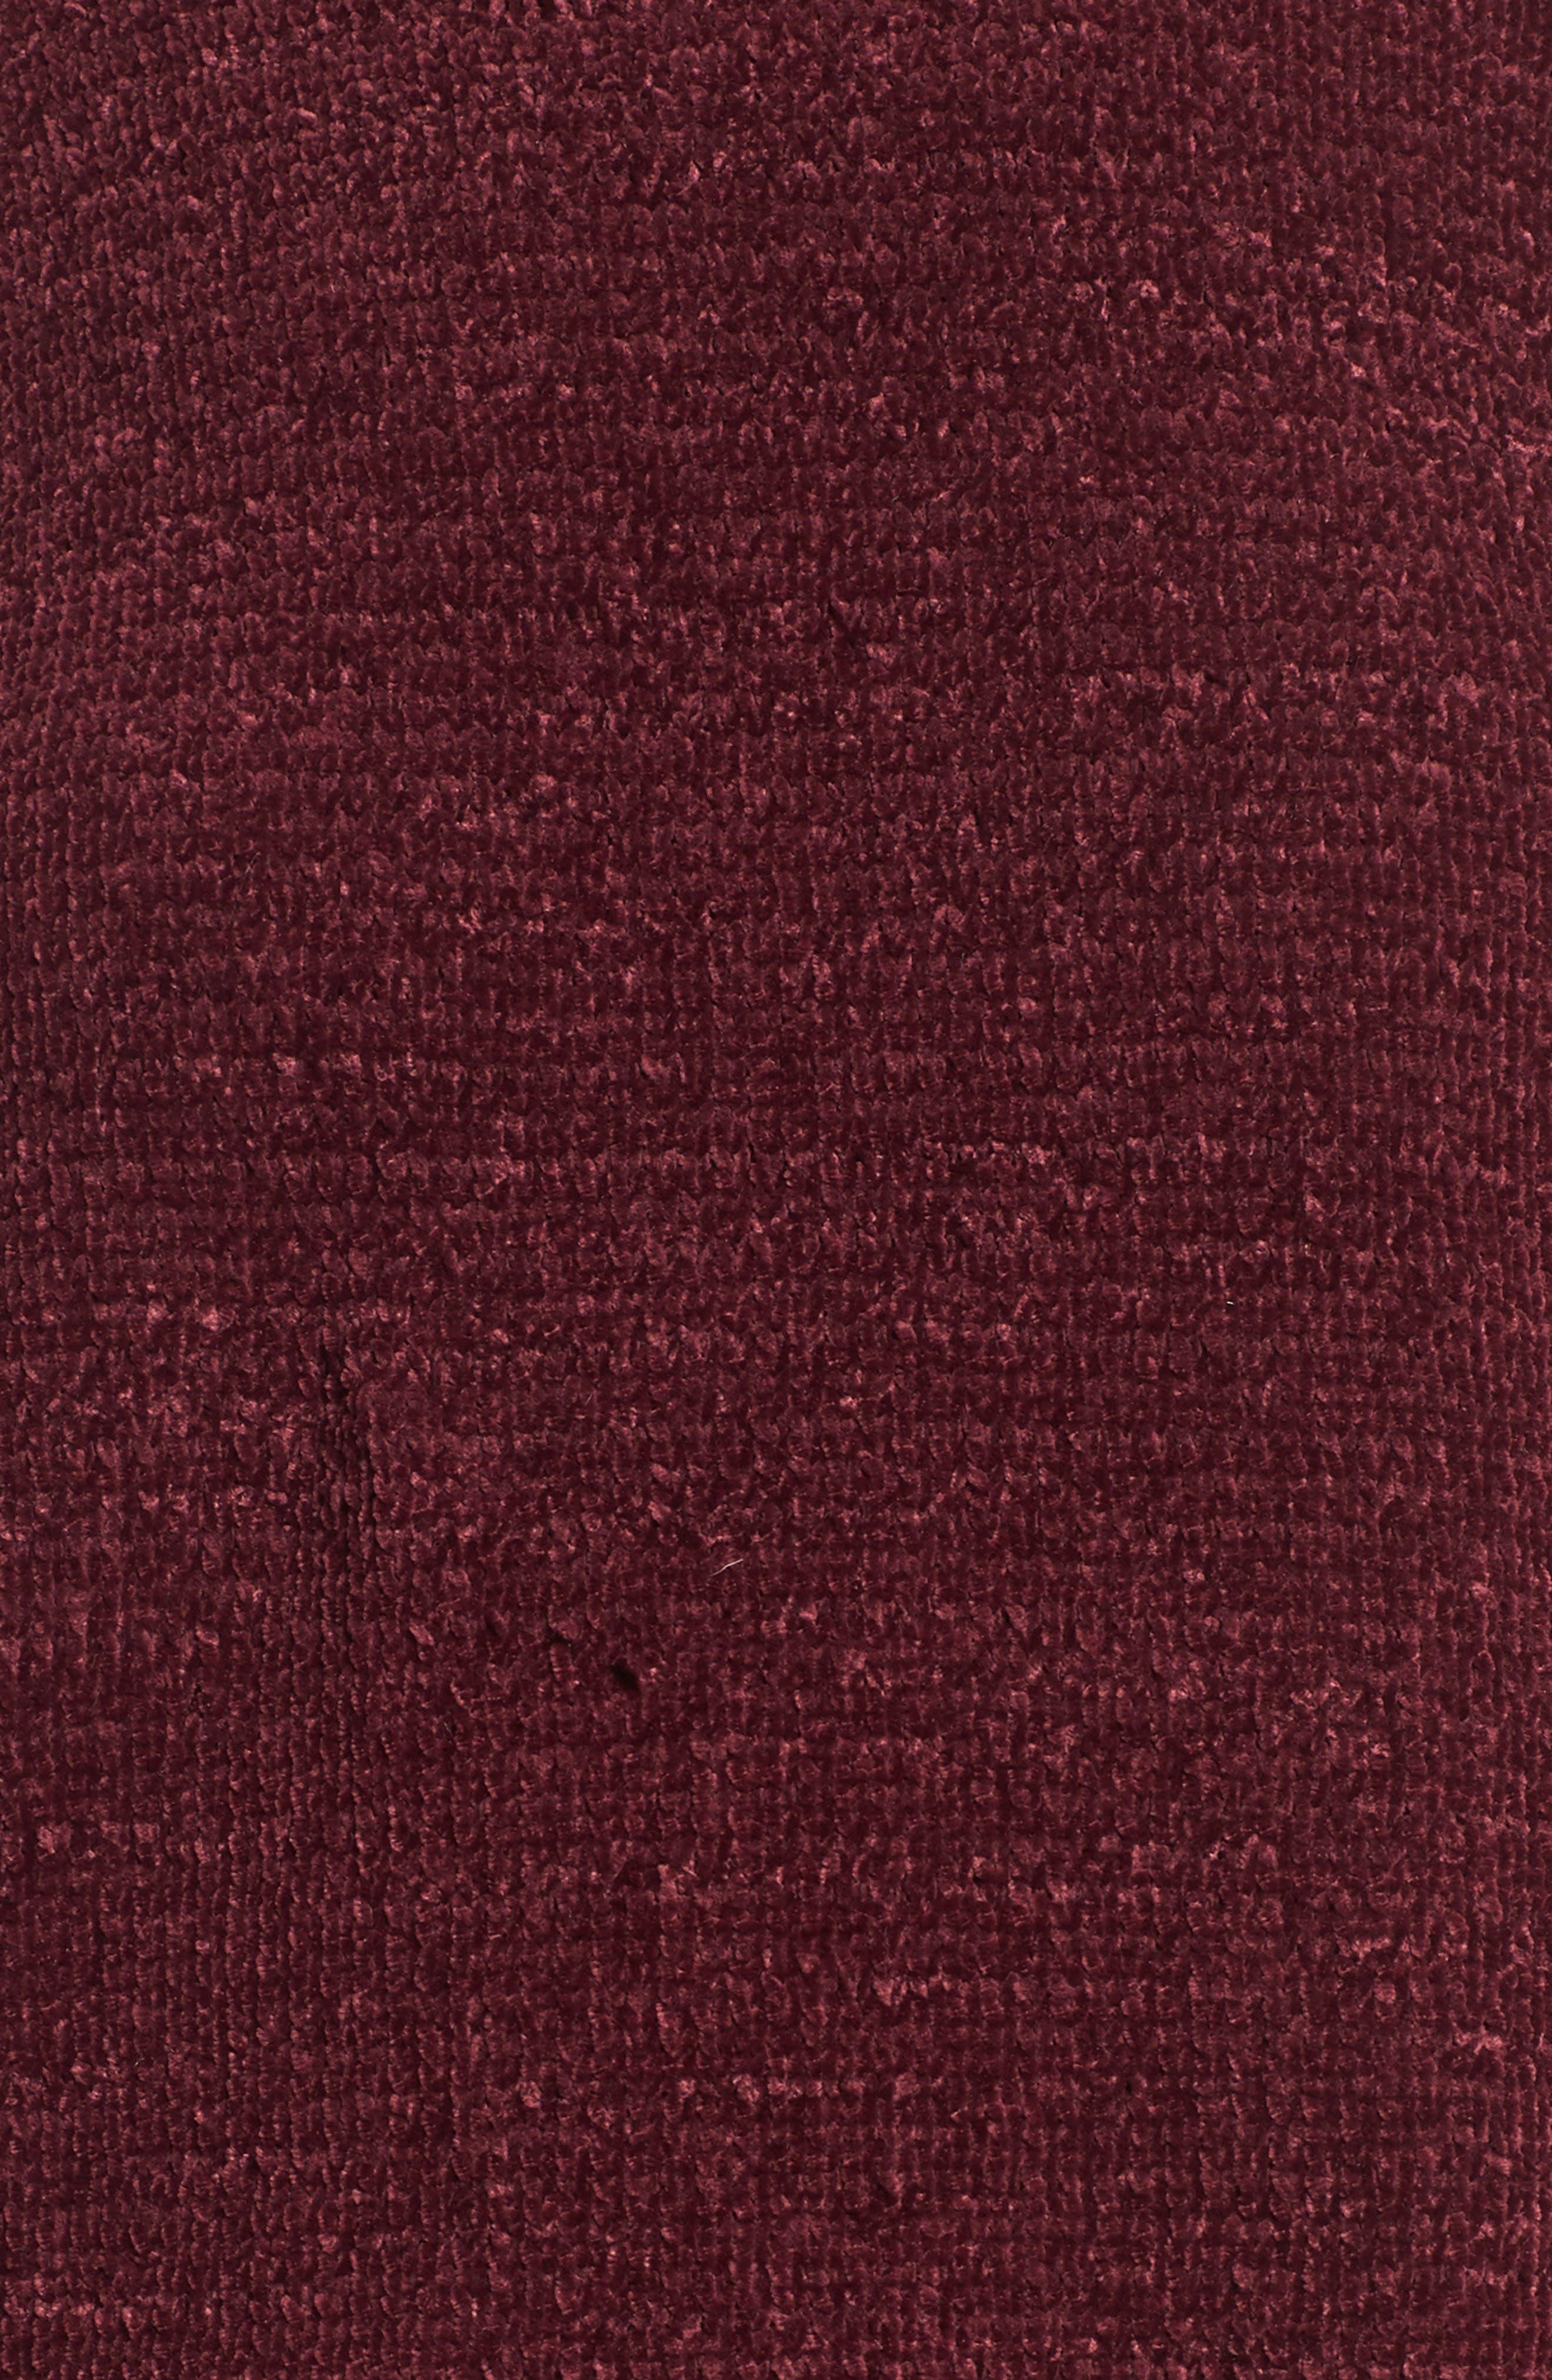 Ruffle Chenille Sweater,                             Alternate thumbnail 10, color,